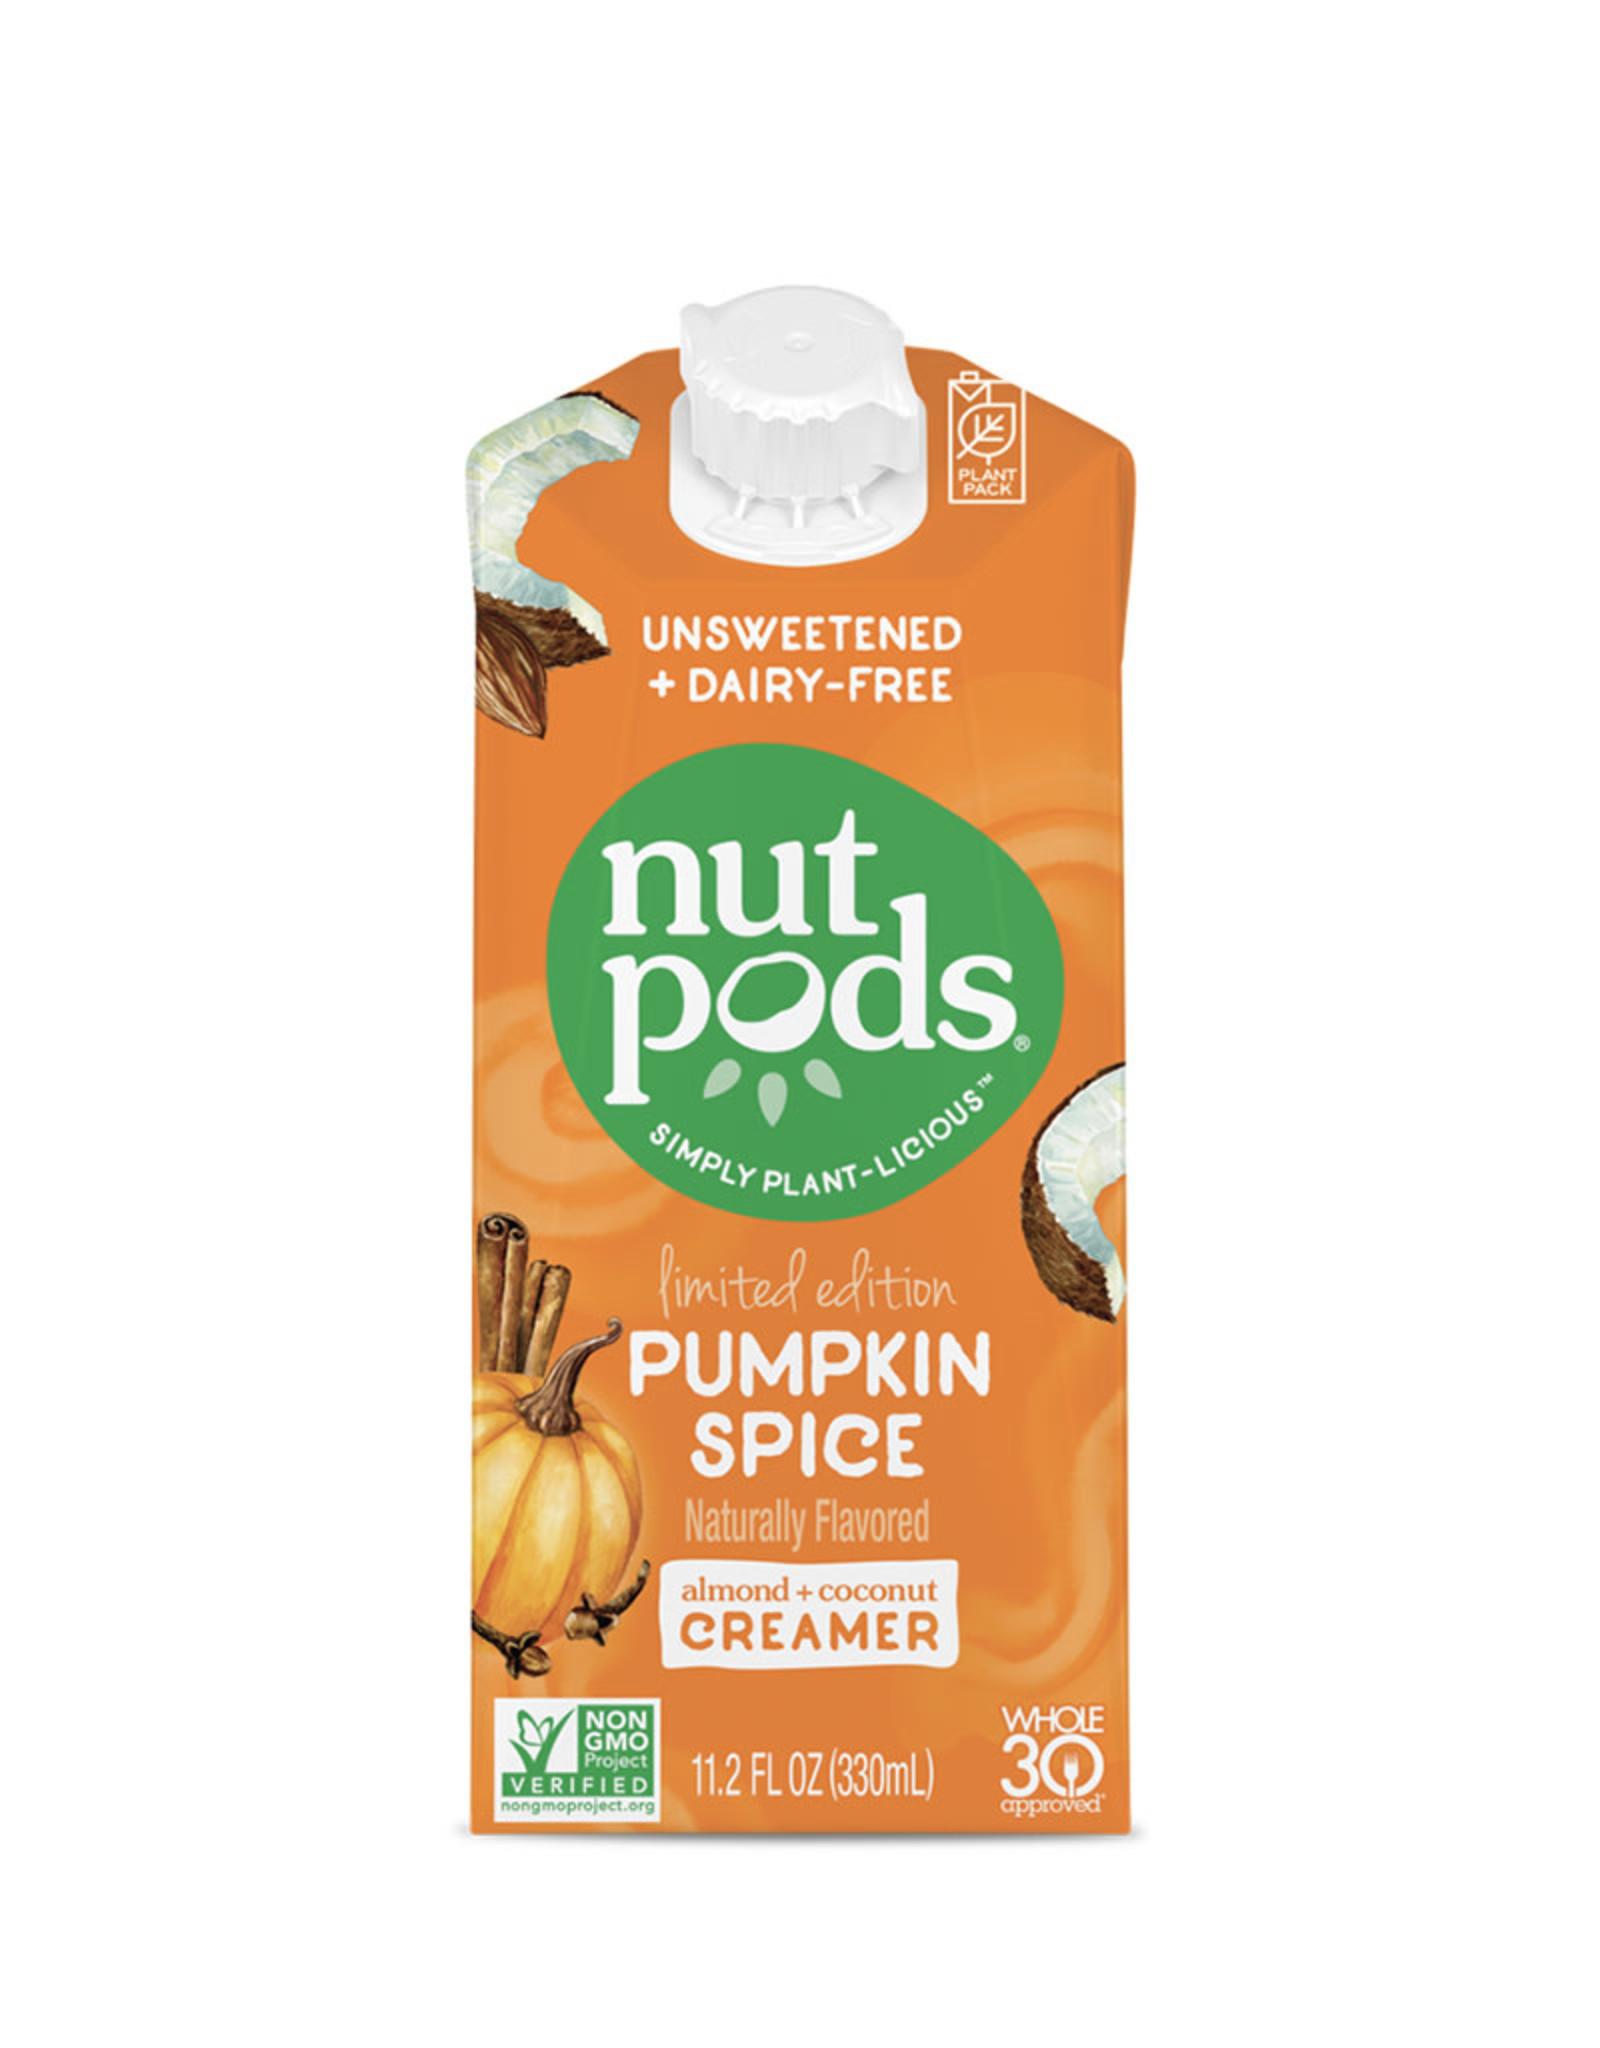 Nut Pods Nutpods - Unsweetened Dairy-Free Creamer, Pumpkin Spice (330ml)